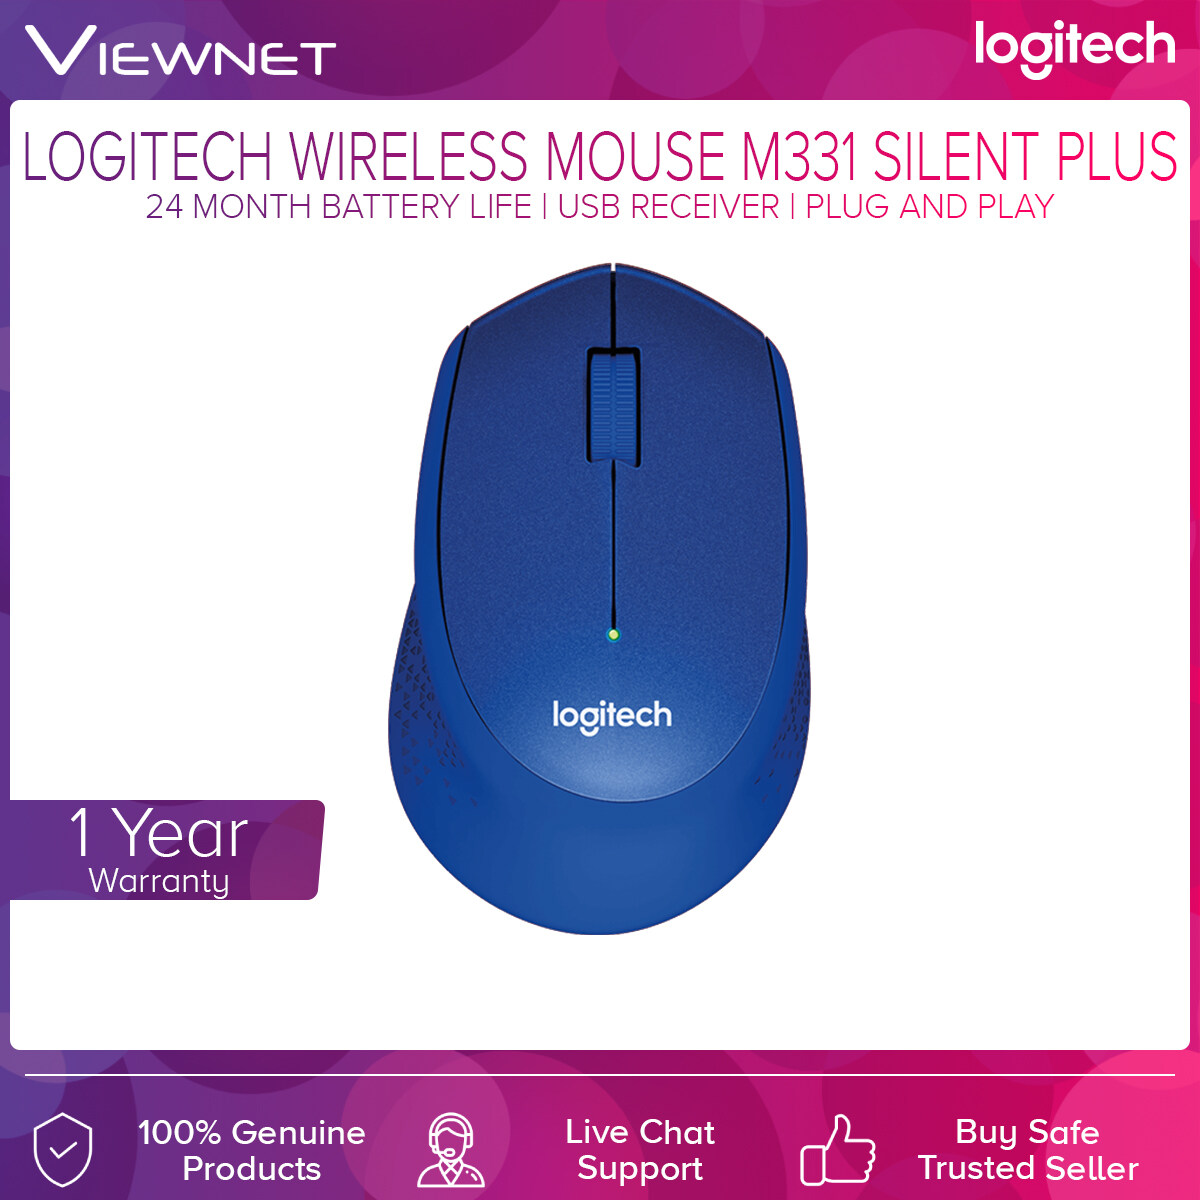 Logitech M331 Silent Plus Wireless Mouse (Black/Red/Blue)